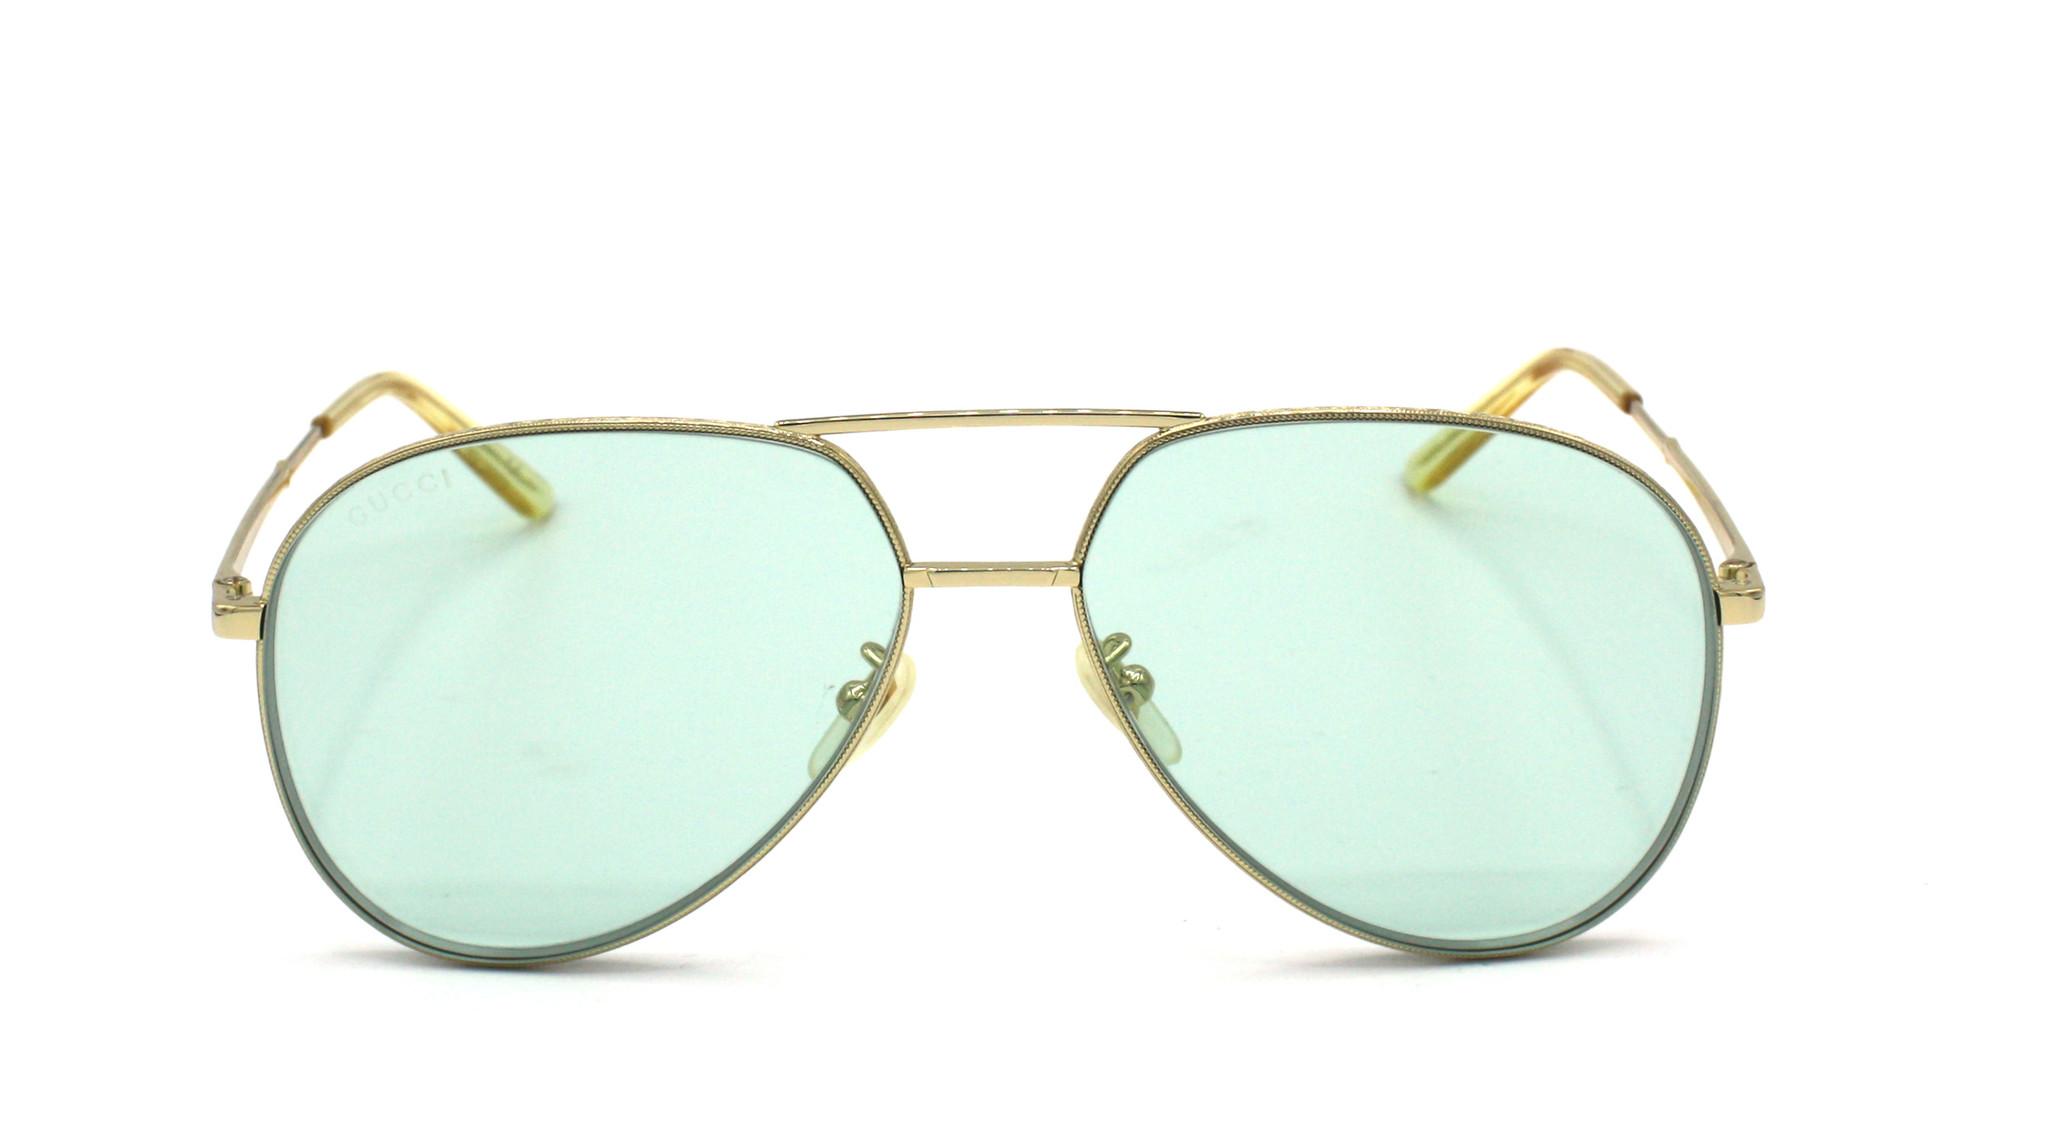 Gucci - GG0356S - 004 - Gold Green-2